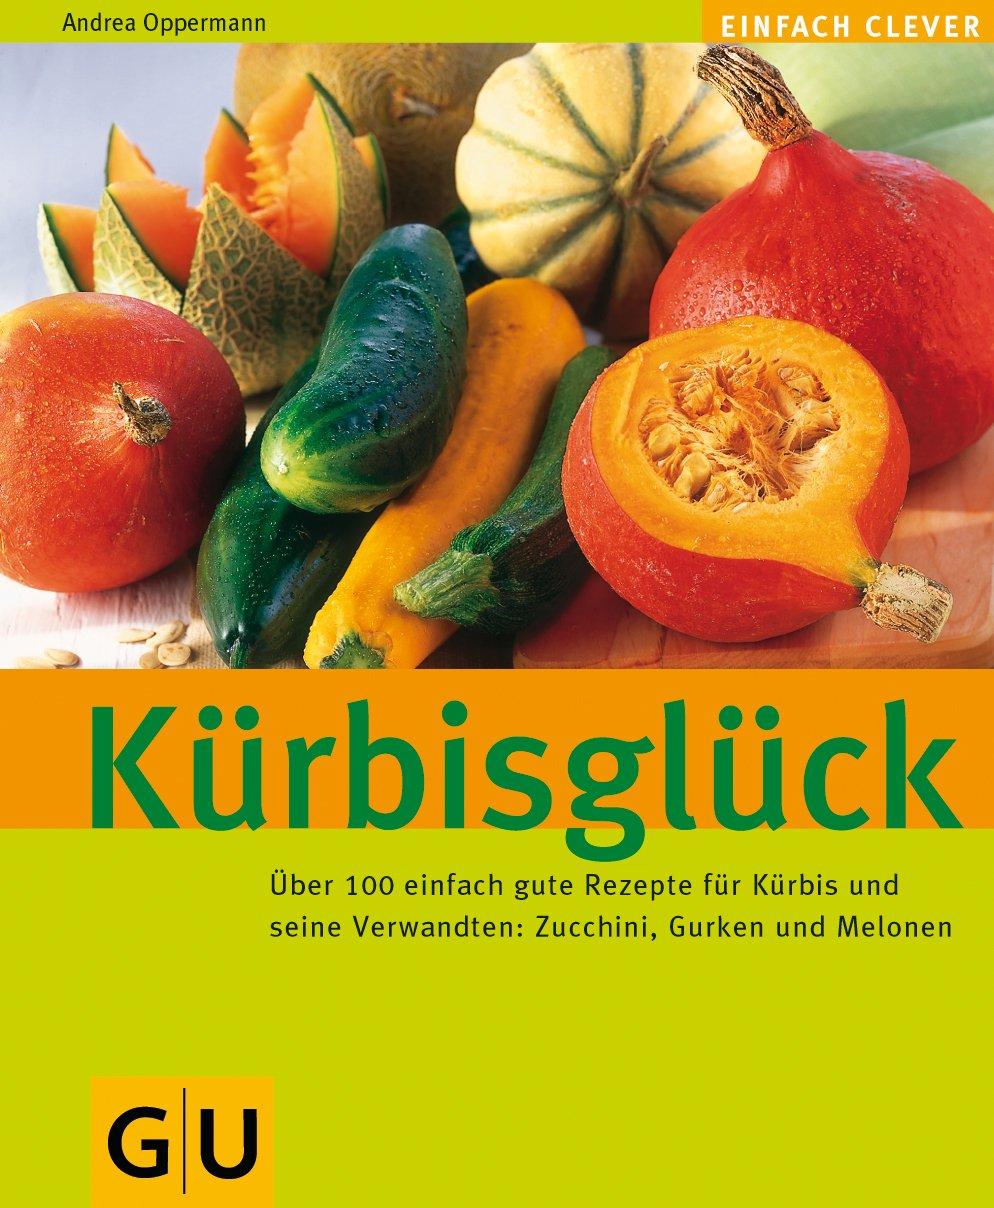 Kürbisglück (GU Altproduktion)